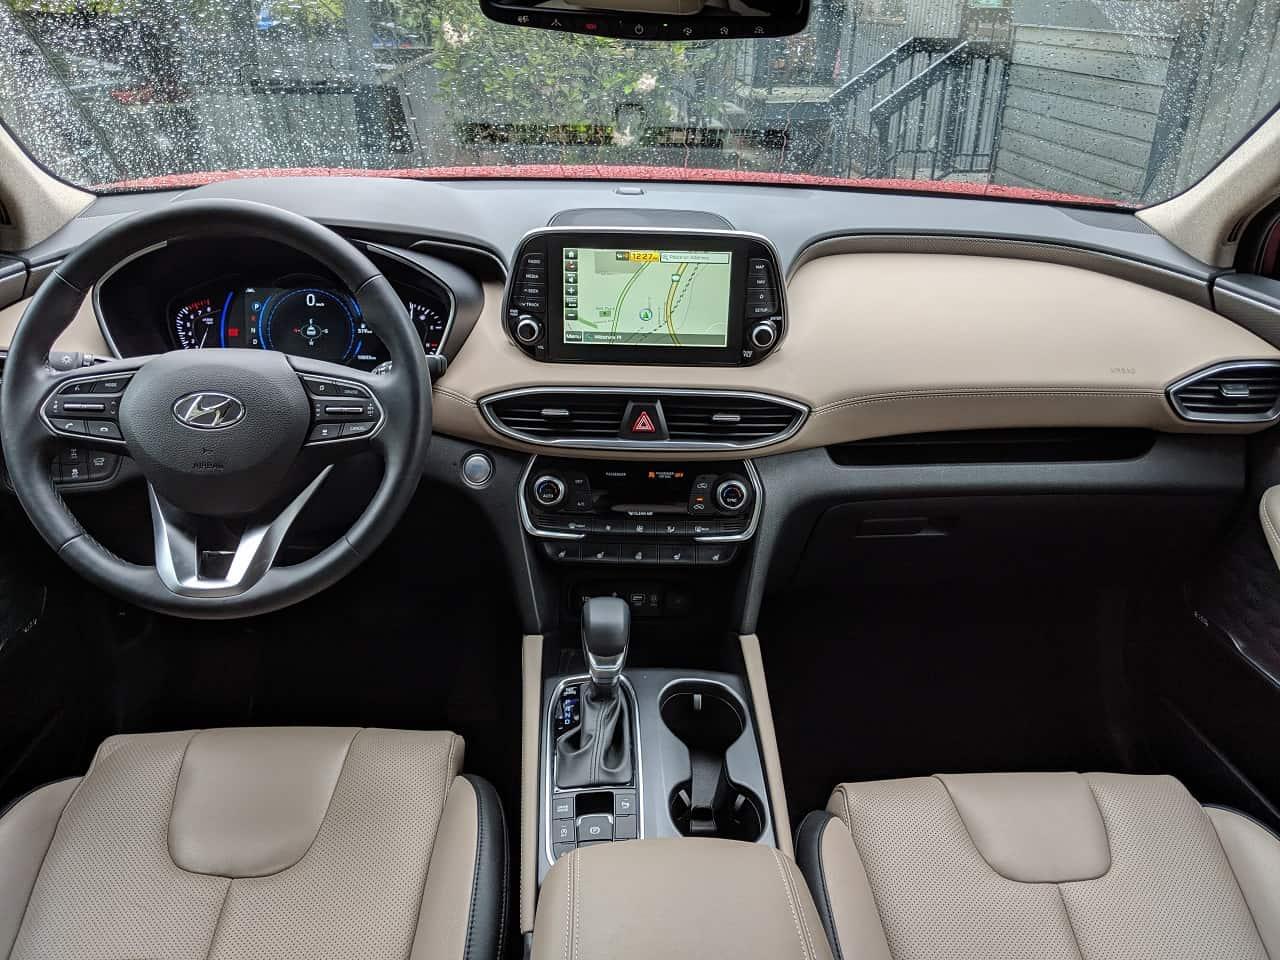 2019 Hyundai Santa Fe Review 6